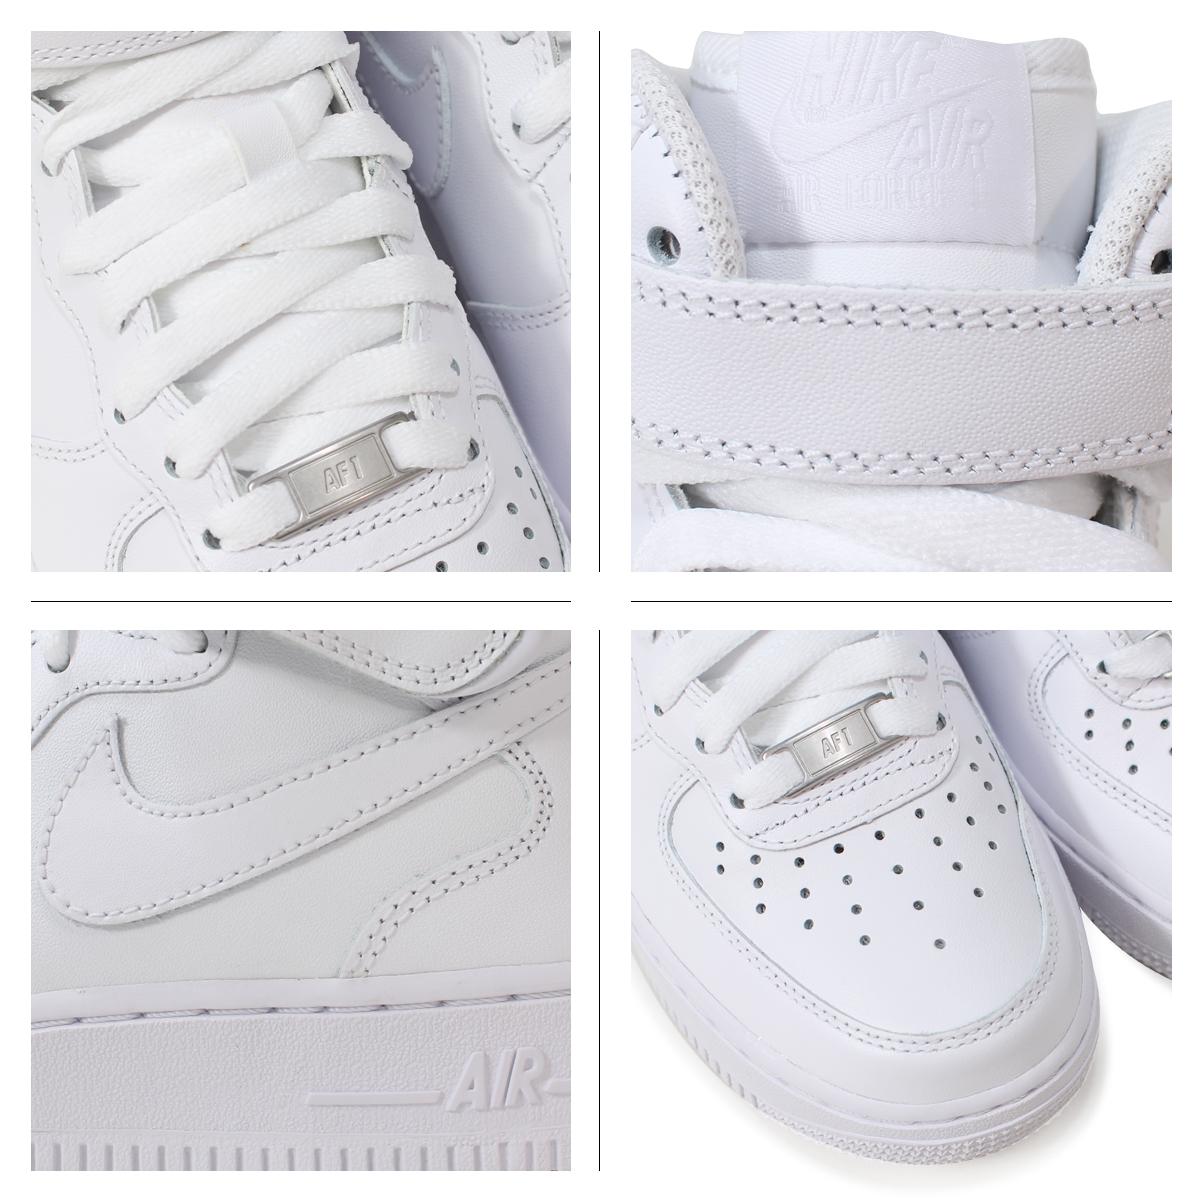 Taiwan Nike Shoes Online